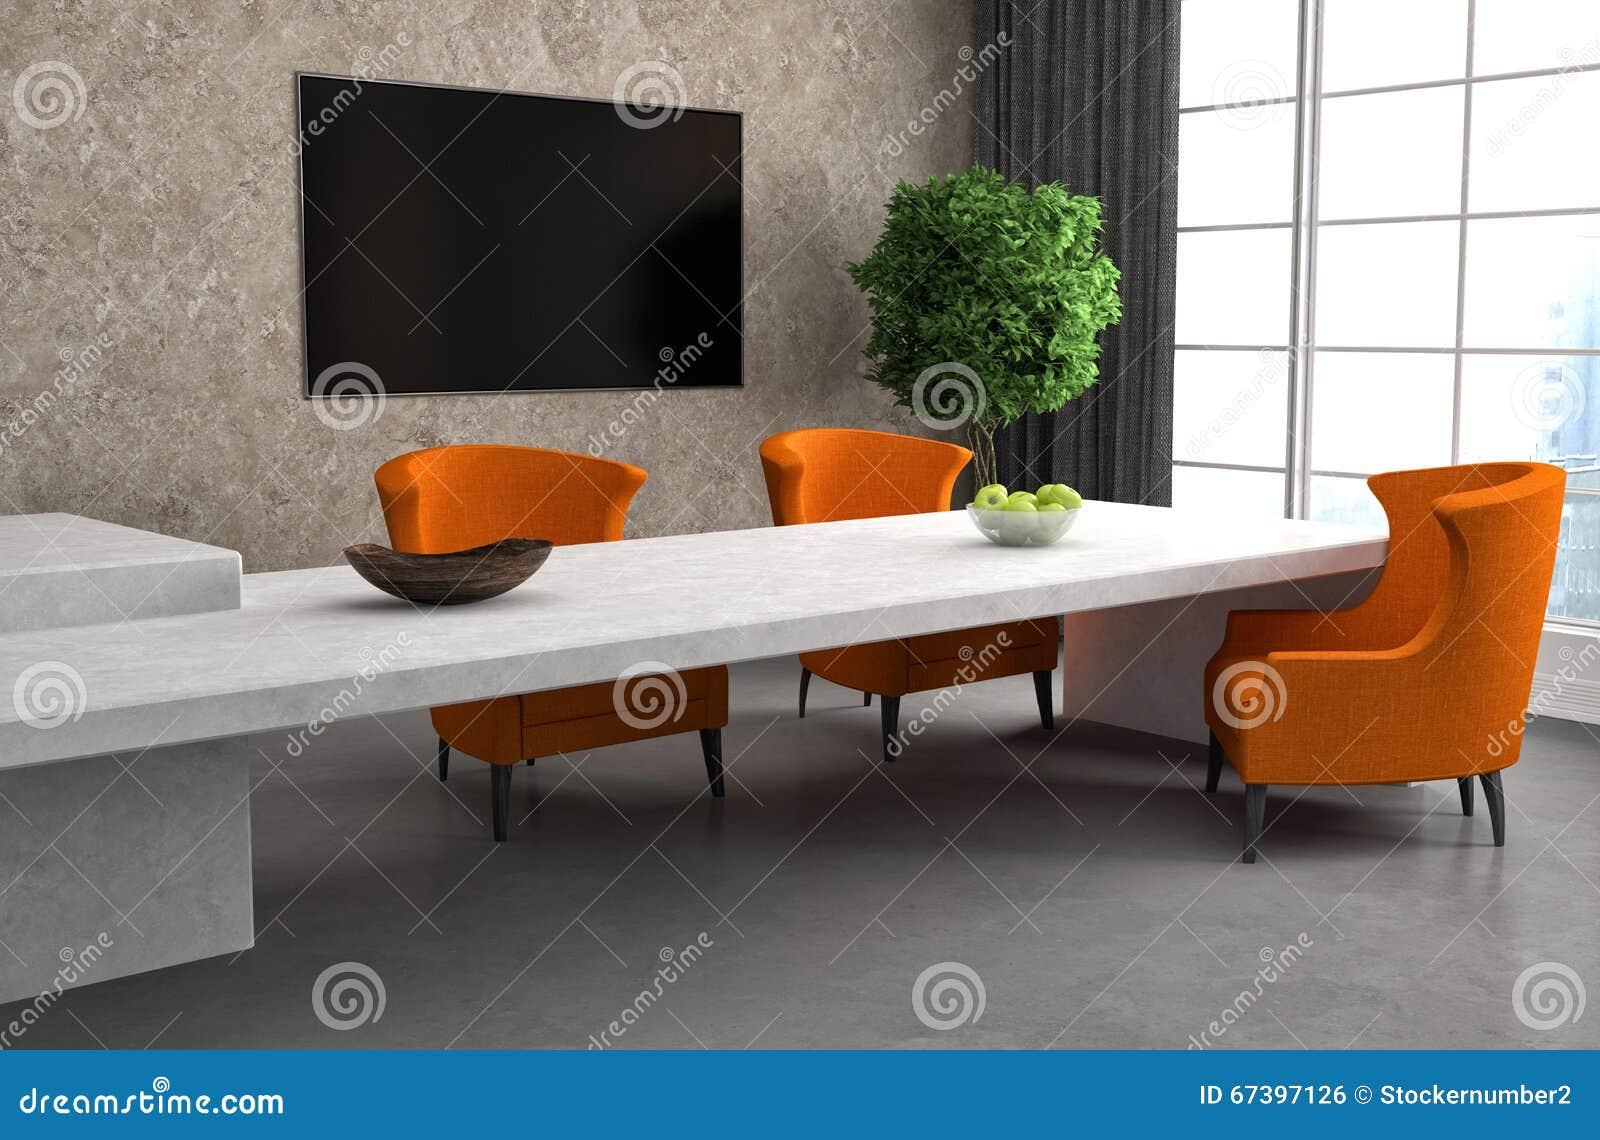 Pavimento Bianco Grigio : Cucina in pavimento bianco e grigio illustrazione d illustrazione